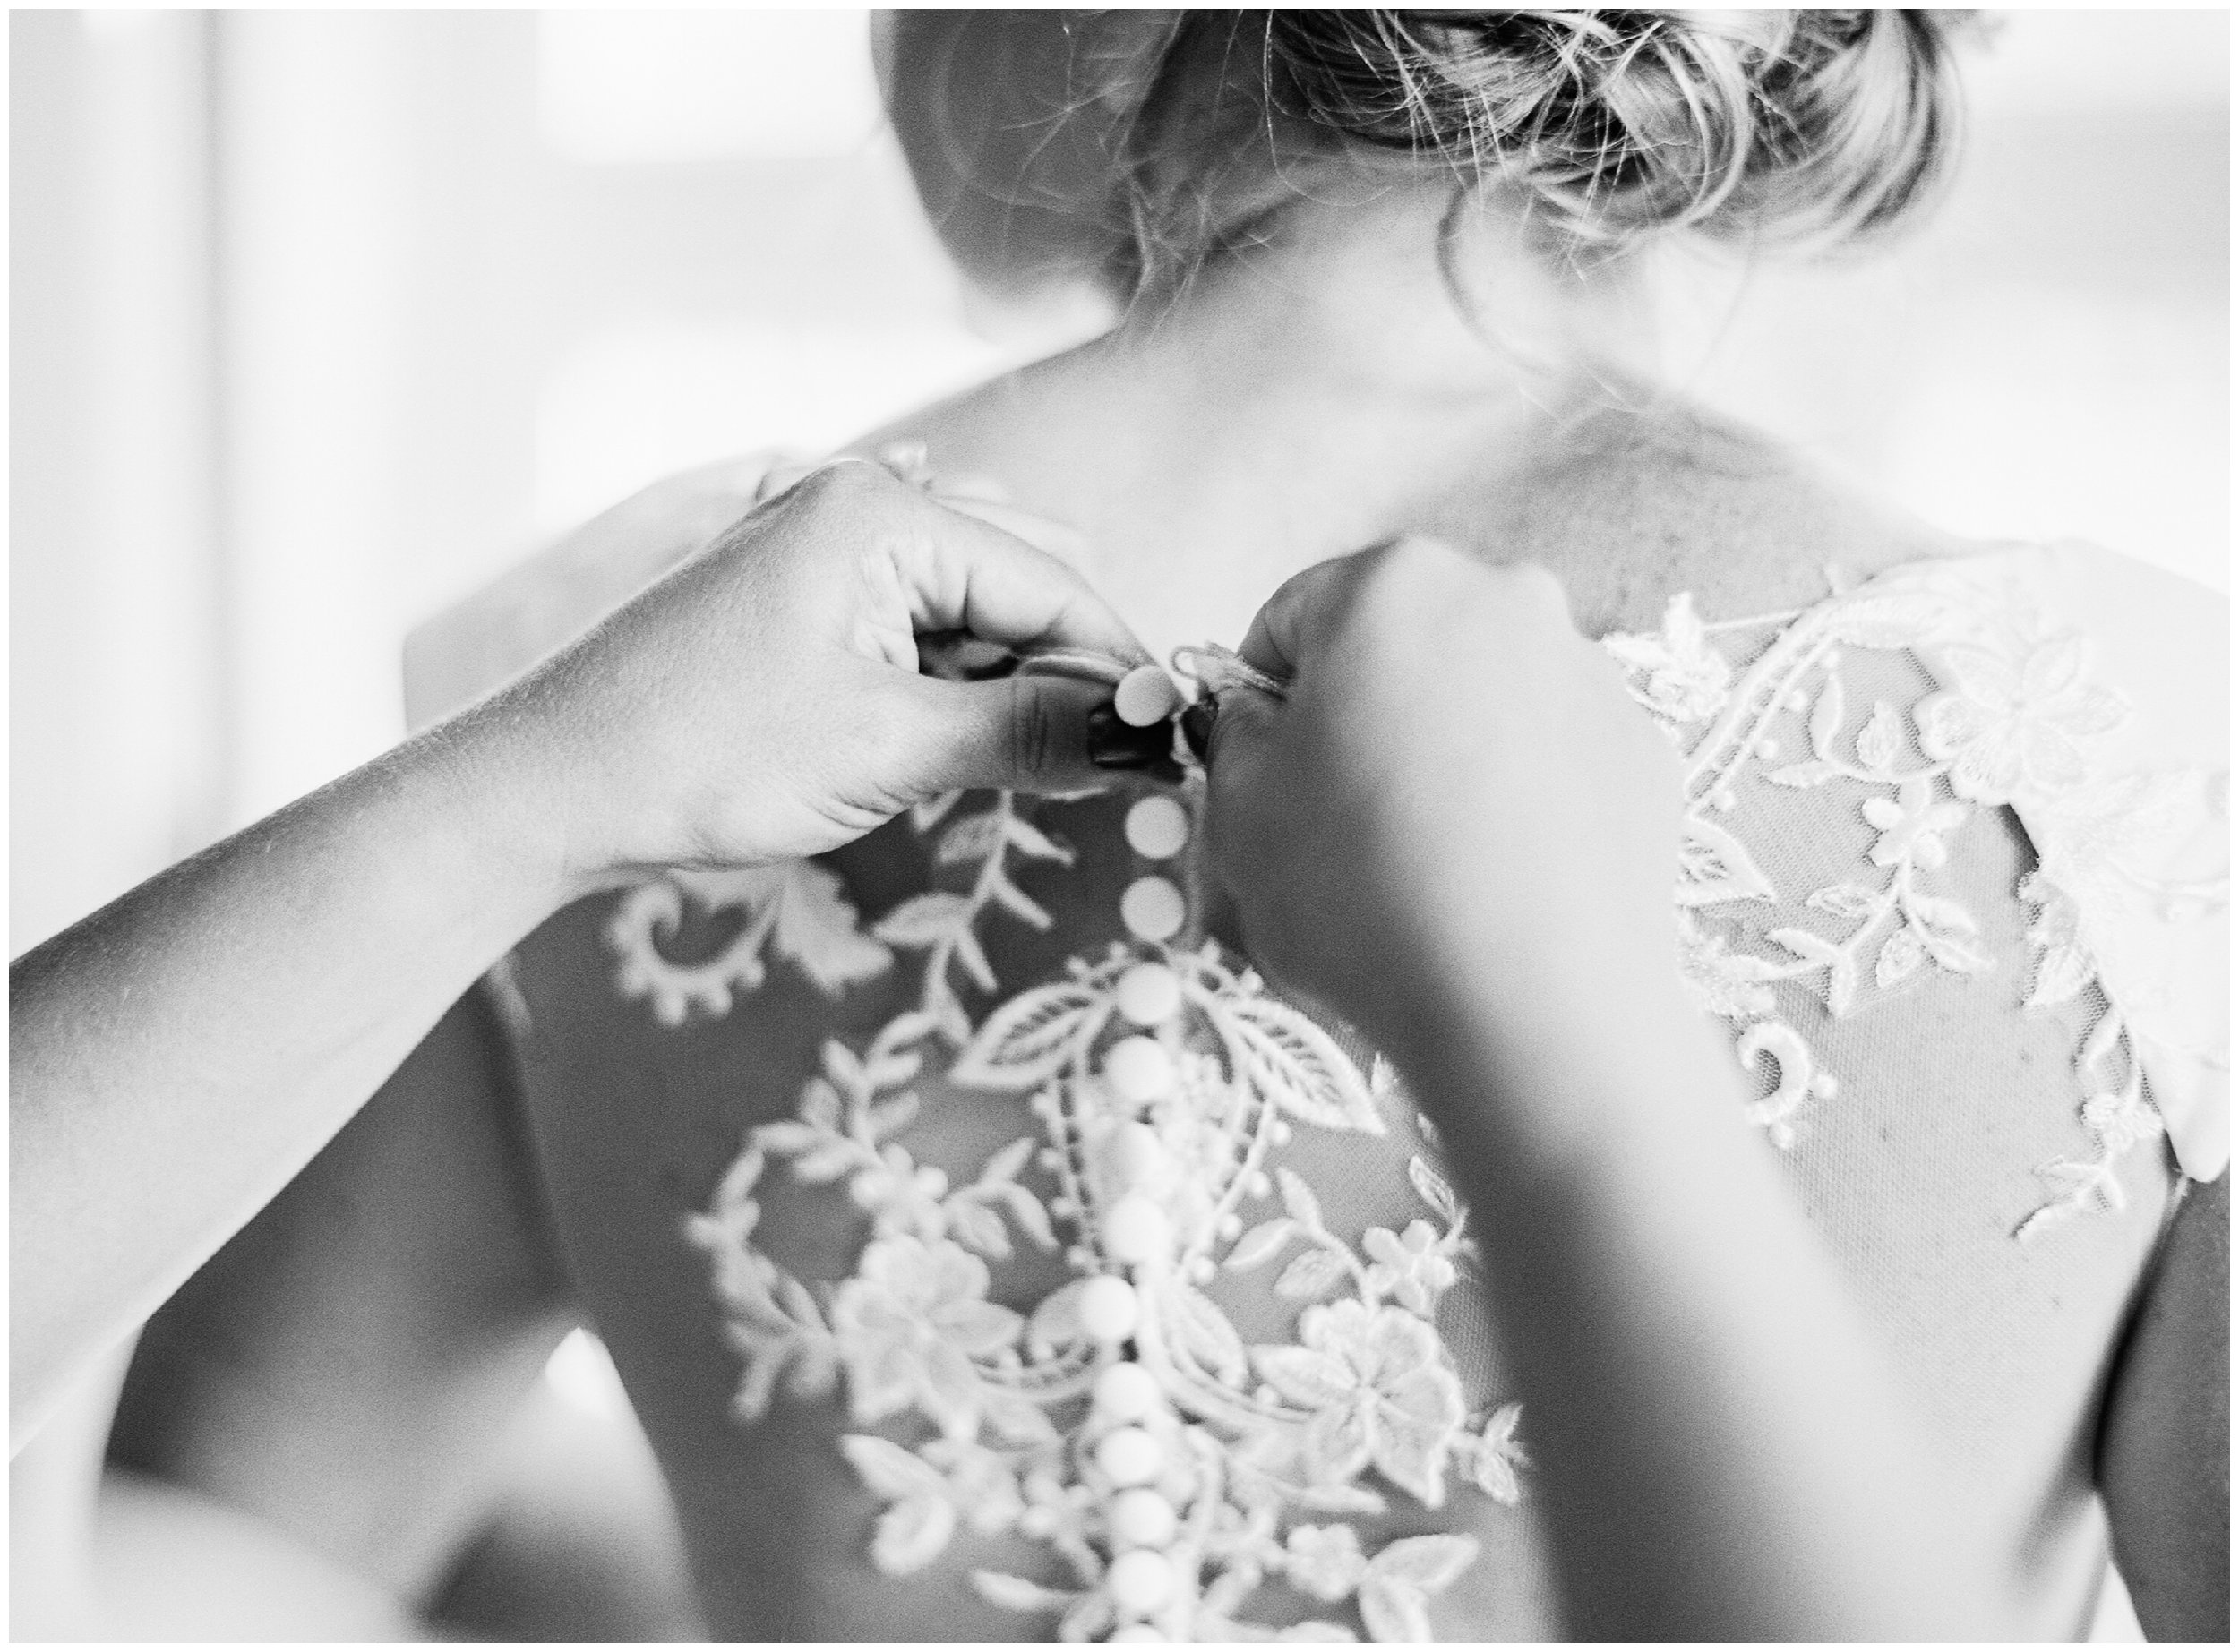 wedding details, bridesmaid helping button dress